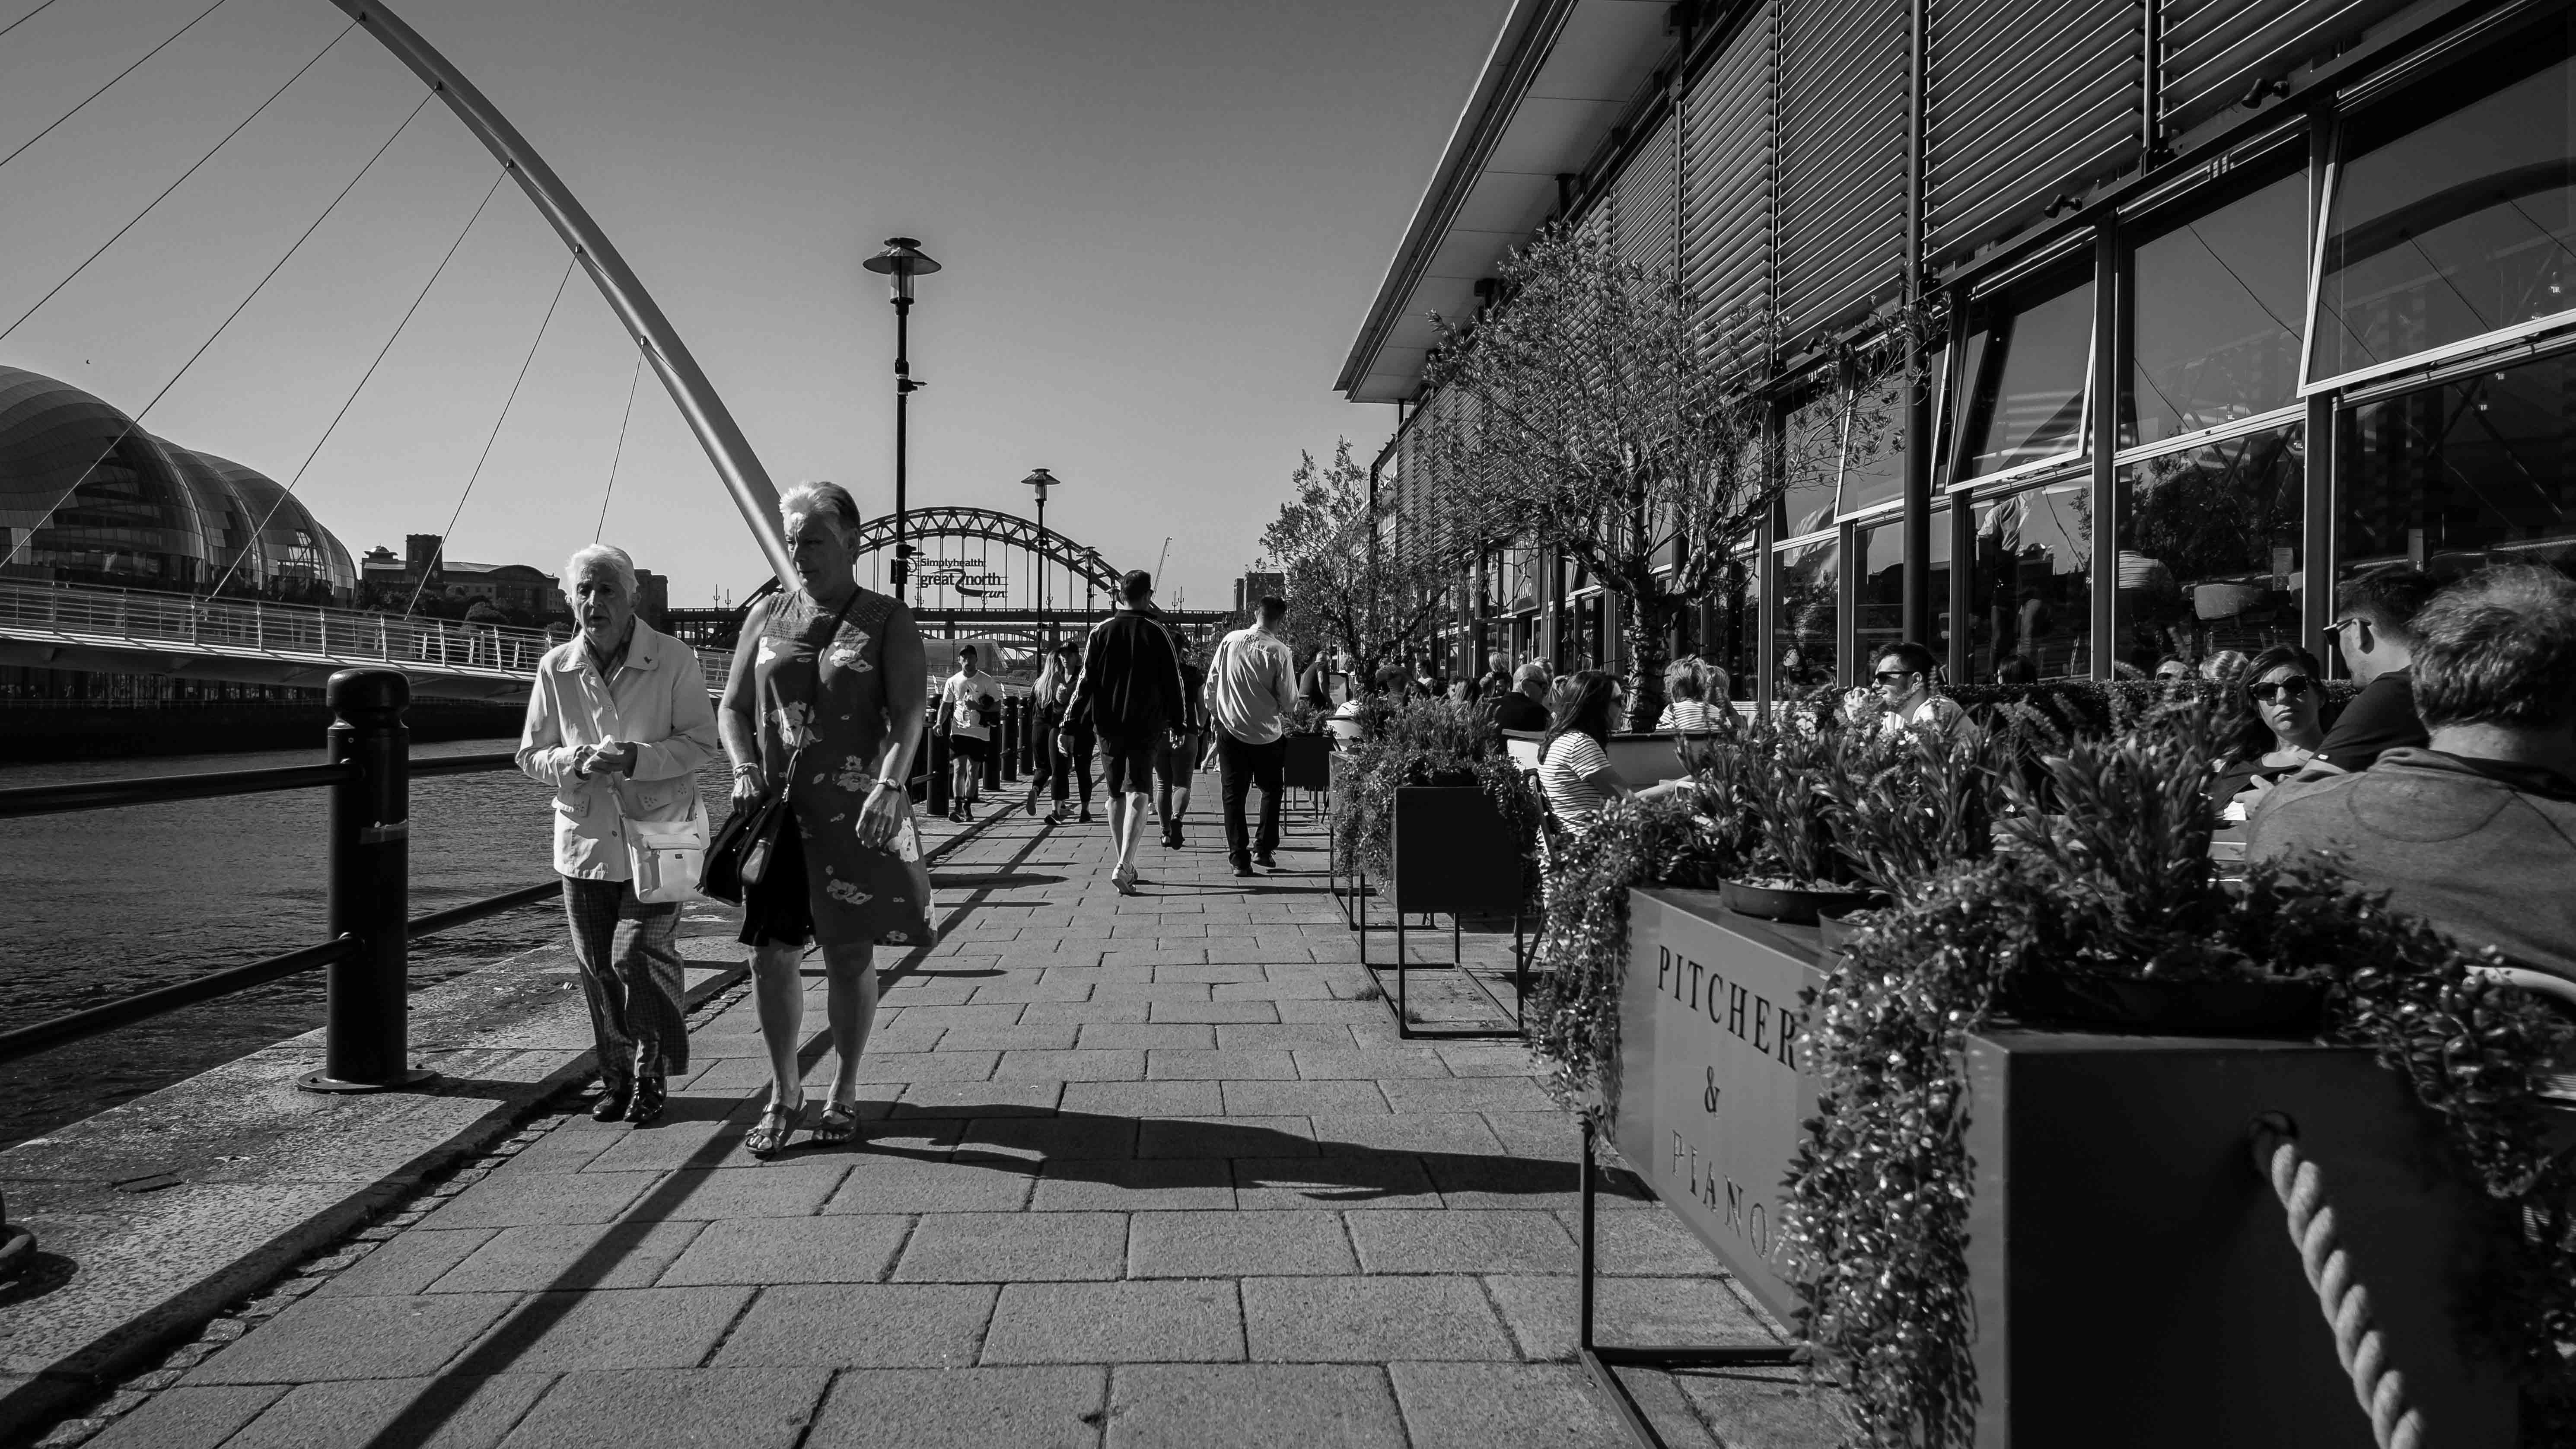 Newcastle – Sept 2019 – people